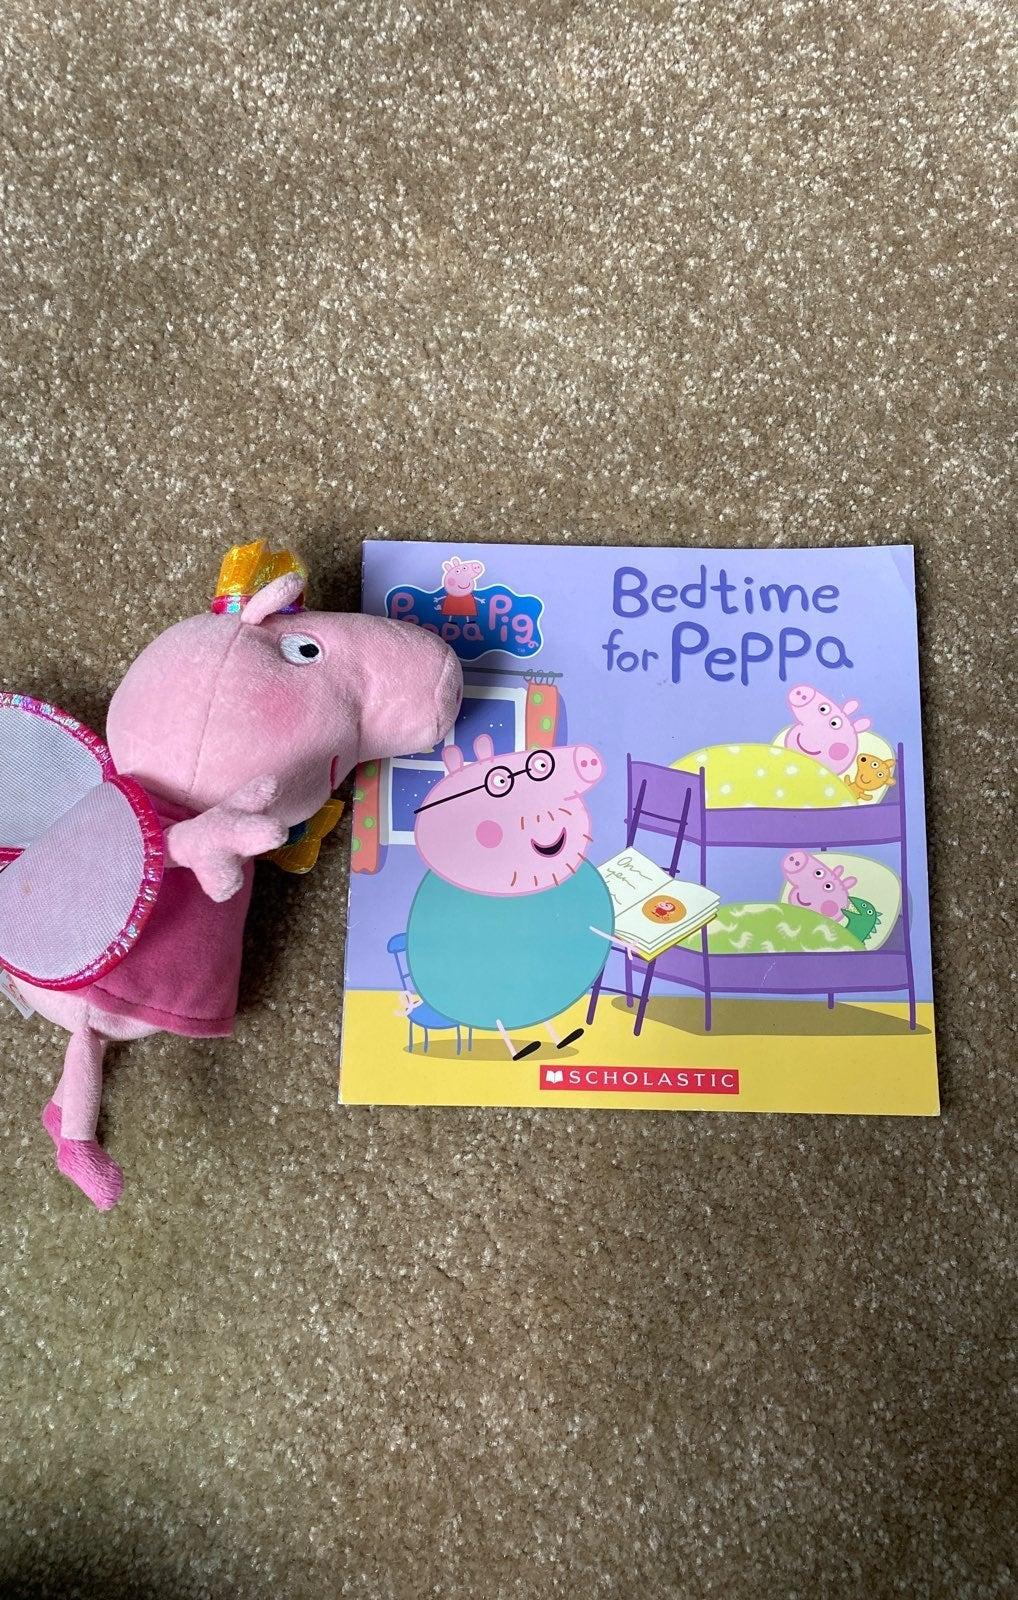 Peppa Pig stuffed animal and book